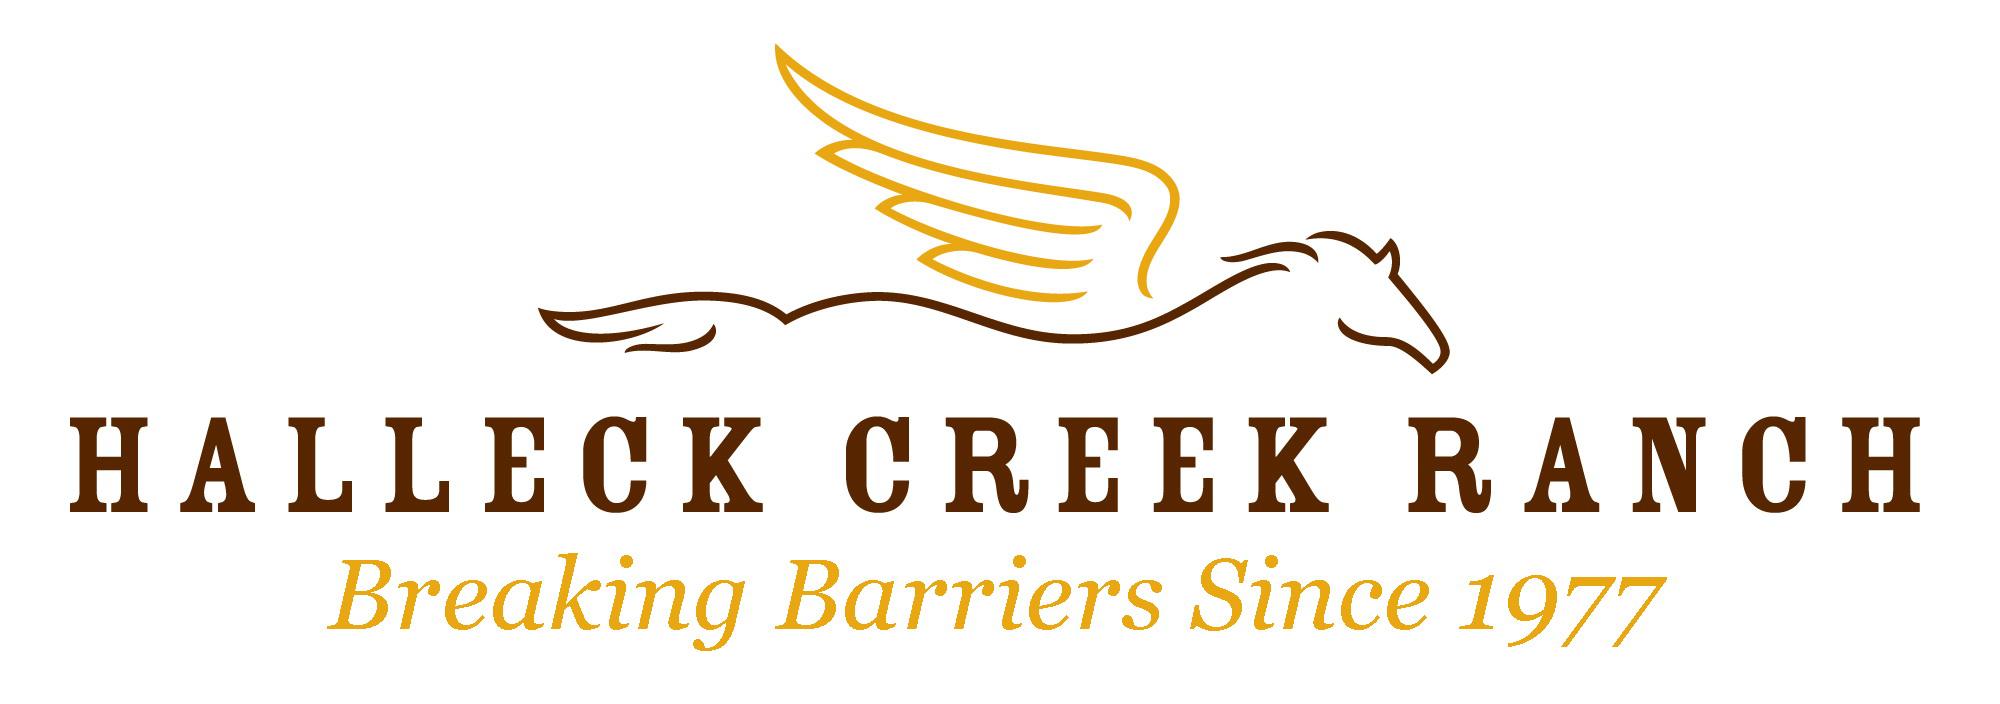 Halleck Creek Ranch